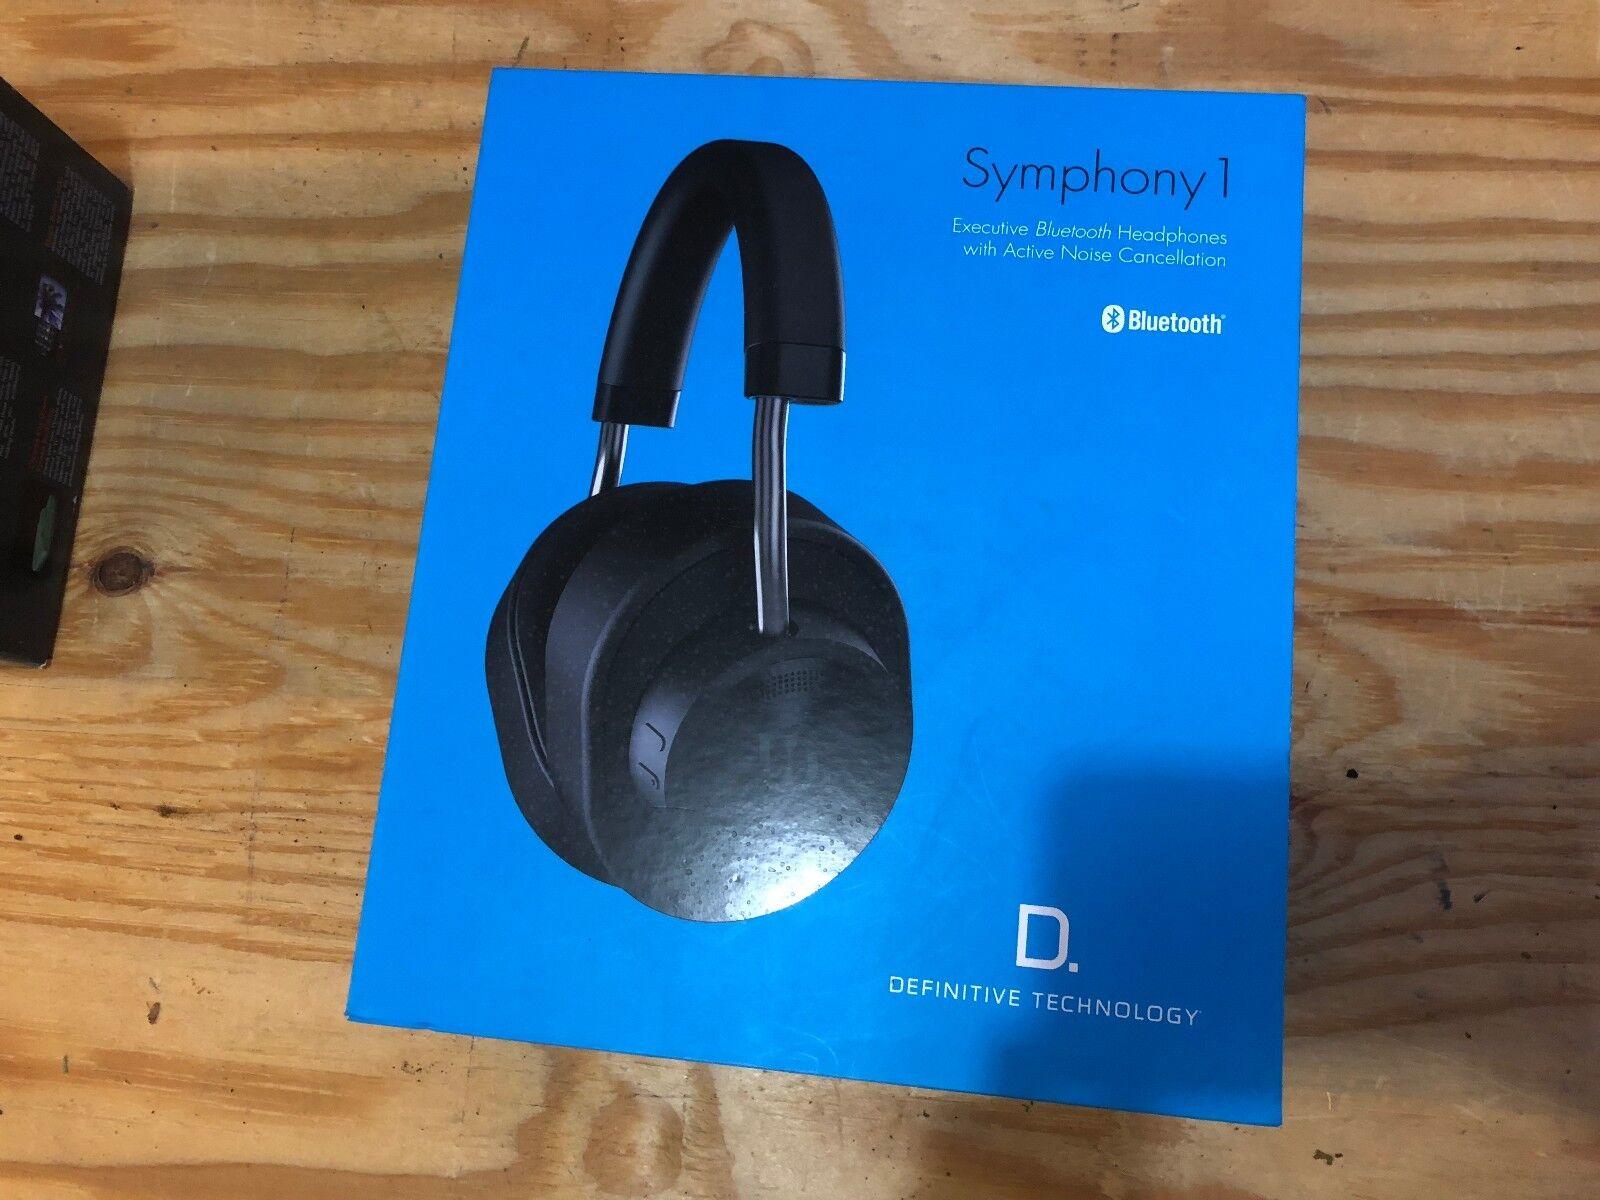 Definitive Technologies Executive Bluetooth Headphones - Symphony 1, used once!